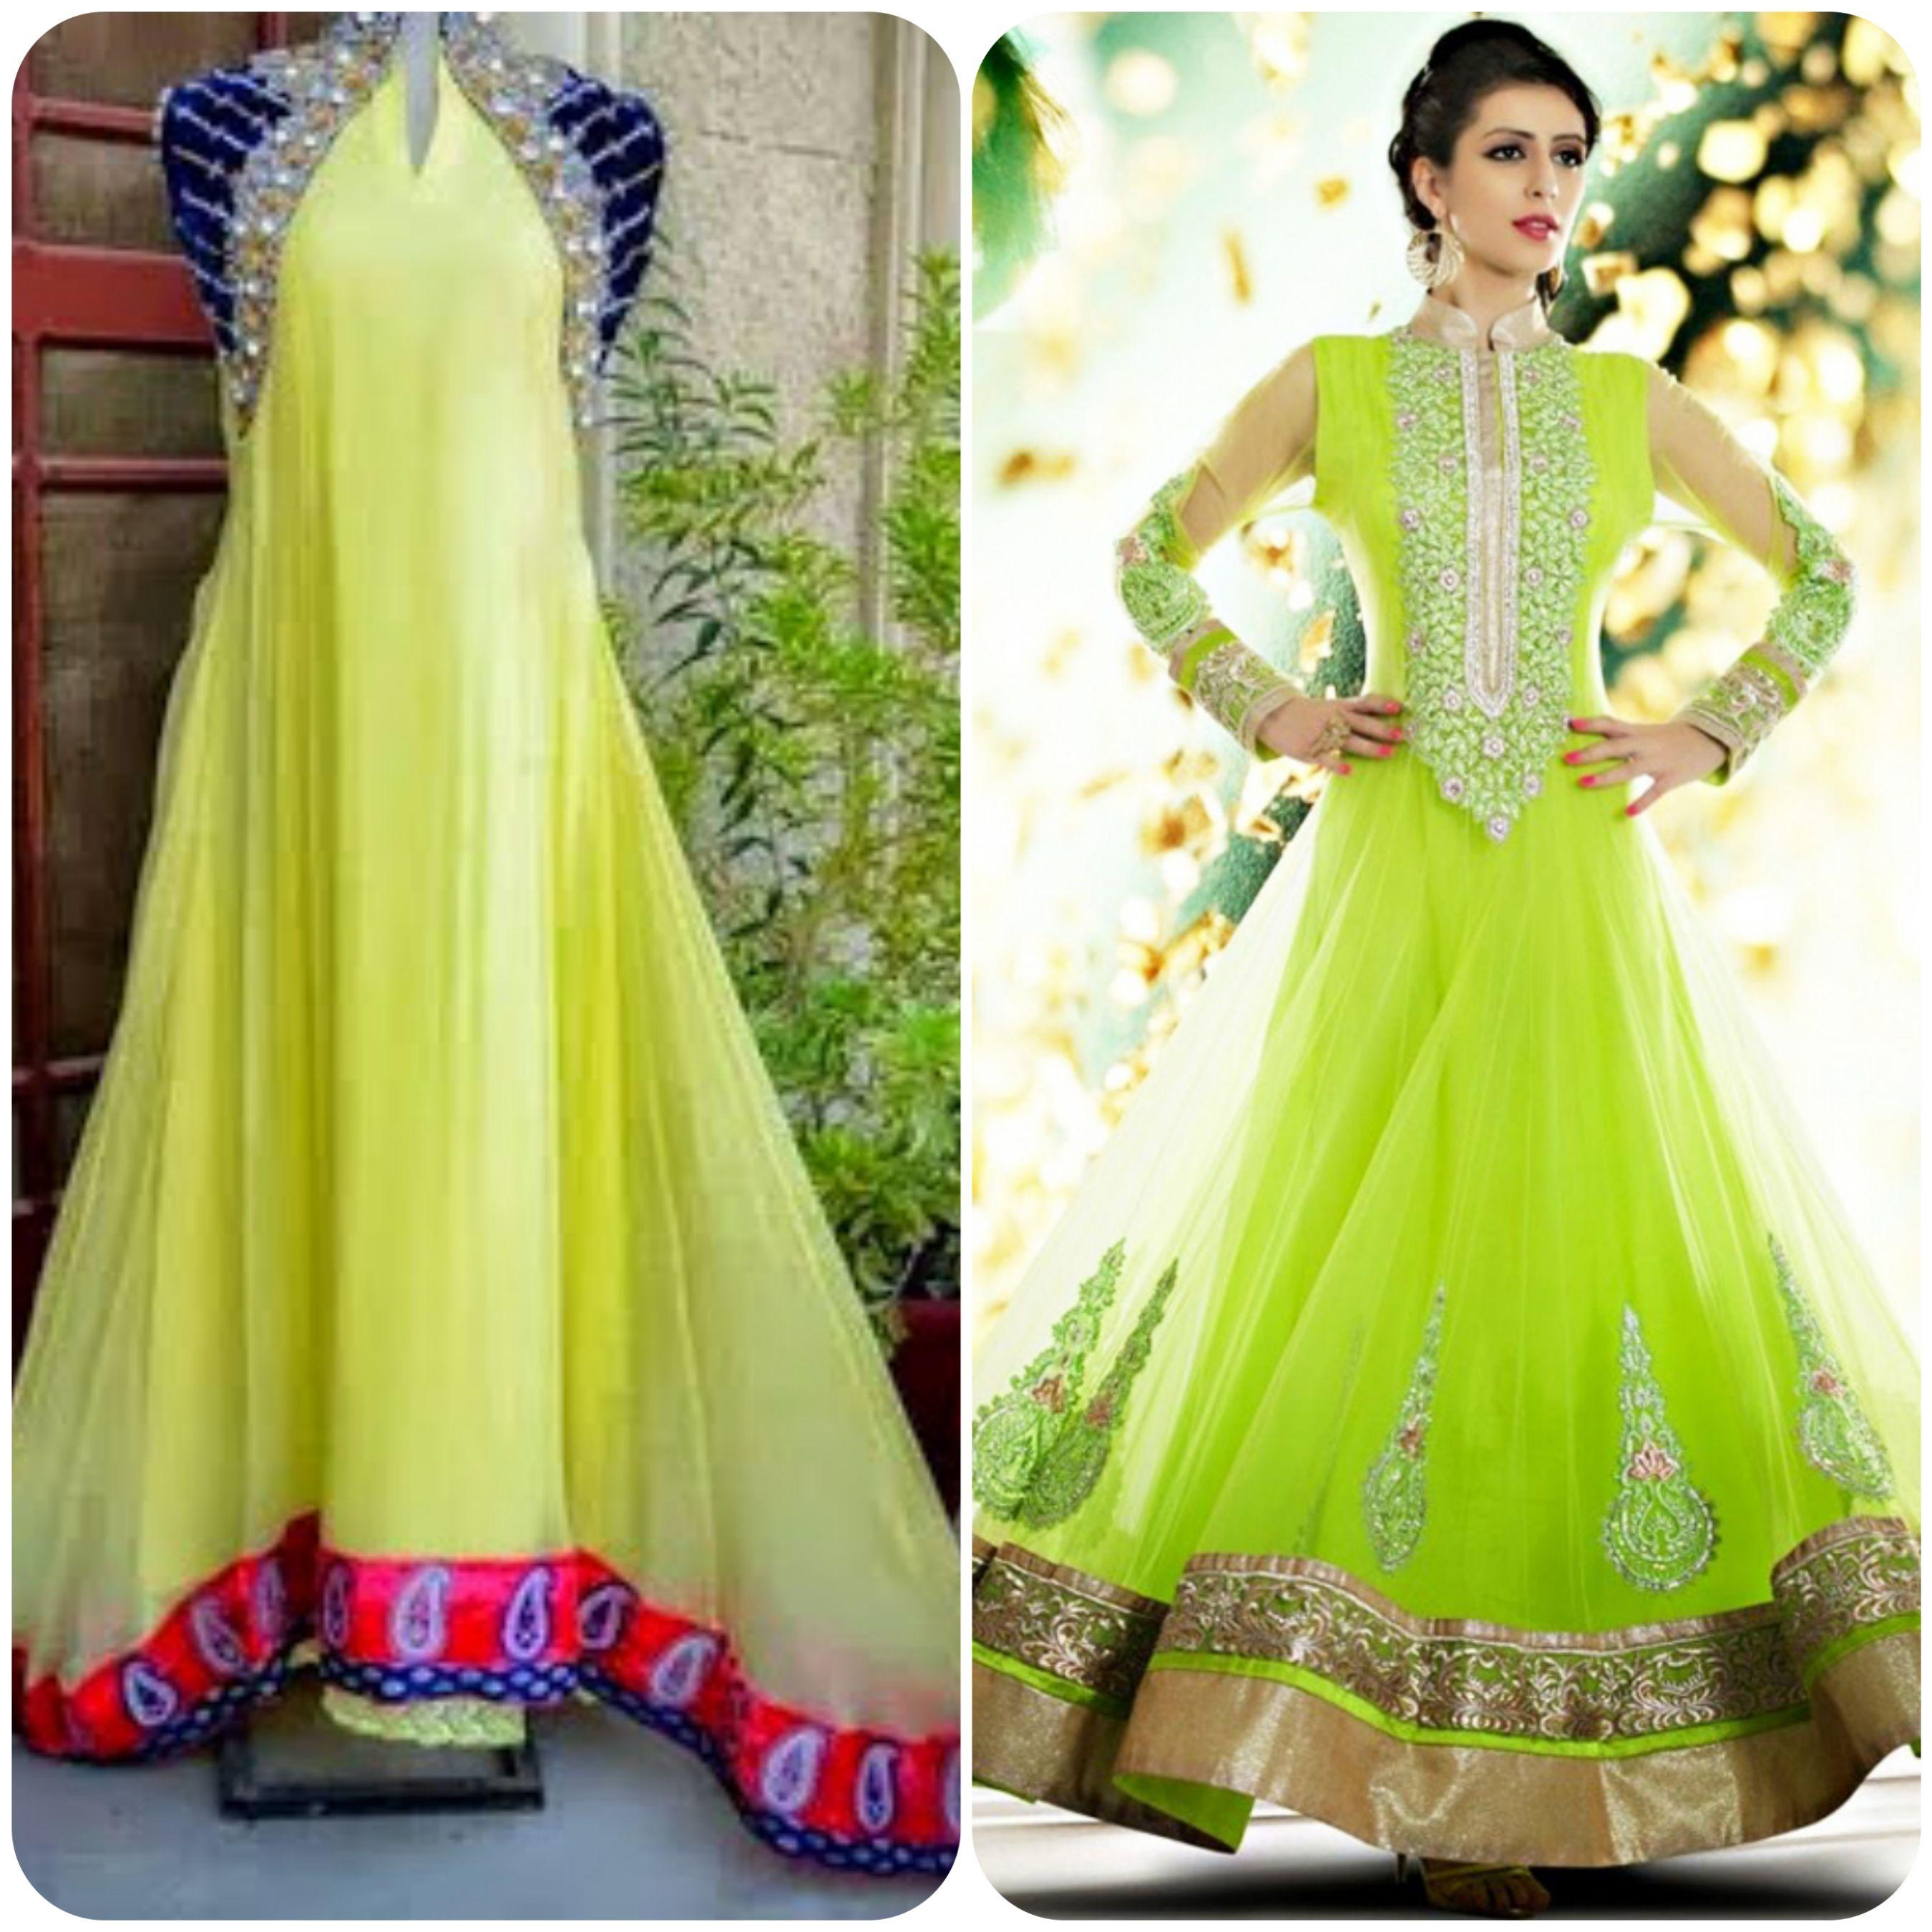 Latest Bridal Mehndi Dresses Designs Collection 20152016